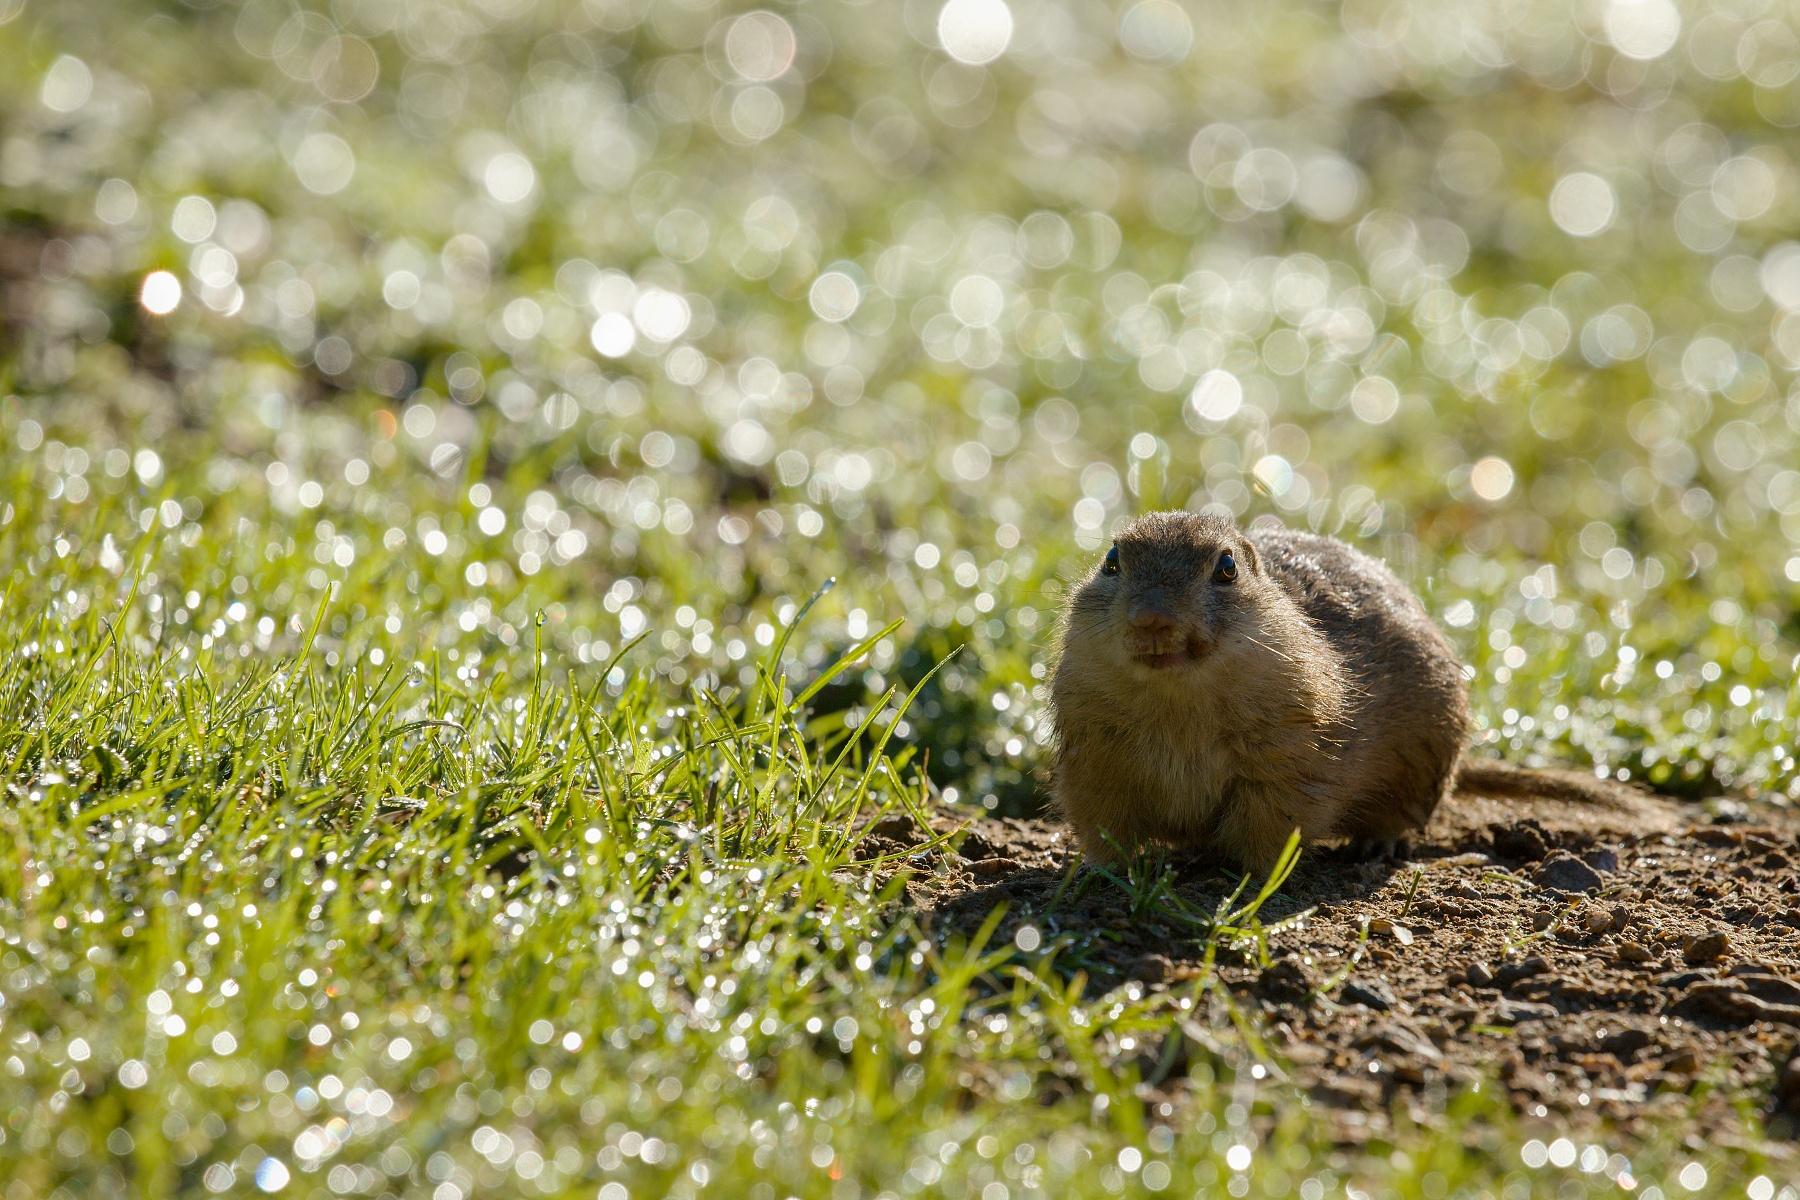 syseľ pasienkový (Spermophilus citellus) European ground squirrel, Muránska planina, Slovensko Canon EOS 6D mark II, Canon 100-400mm, f4.5-5.6 L IS II USM, 400 mm, f9, 1/500, ISO 400, 9. september 2020